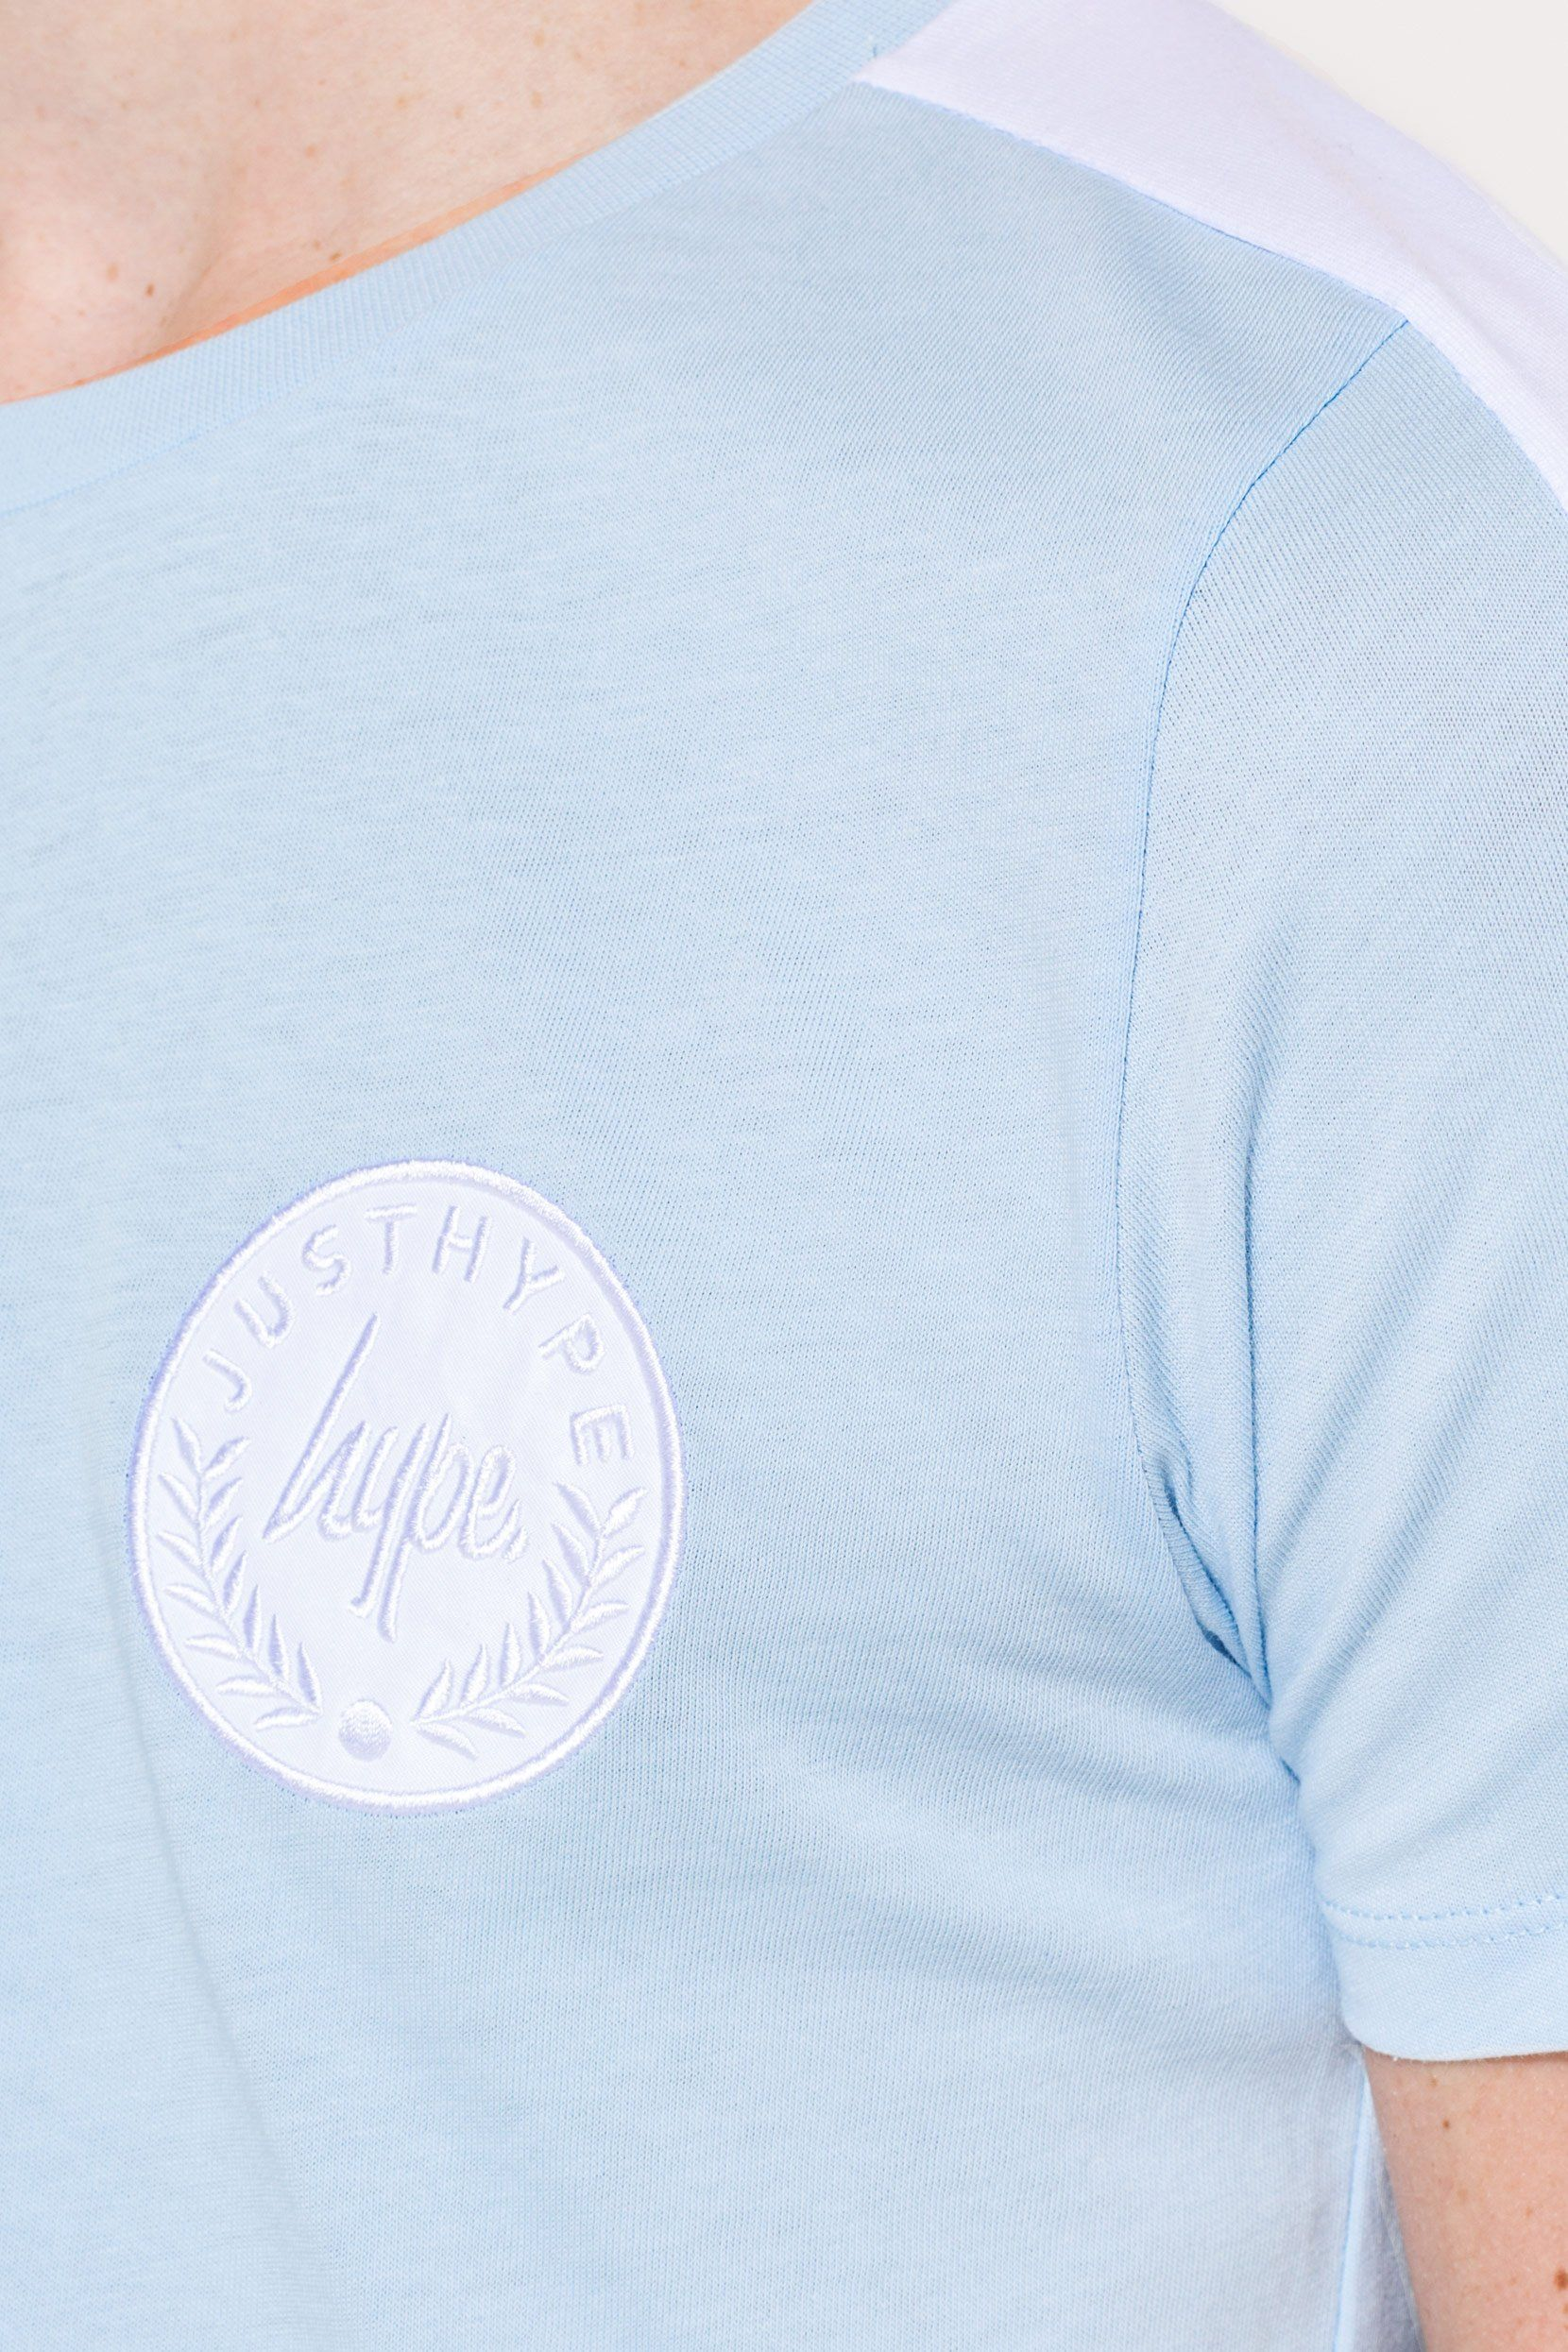 HYPE BLUE SIDE STRIPE CREST KIDS T-SHIRT